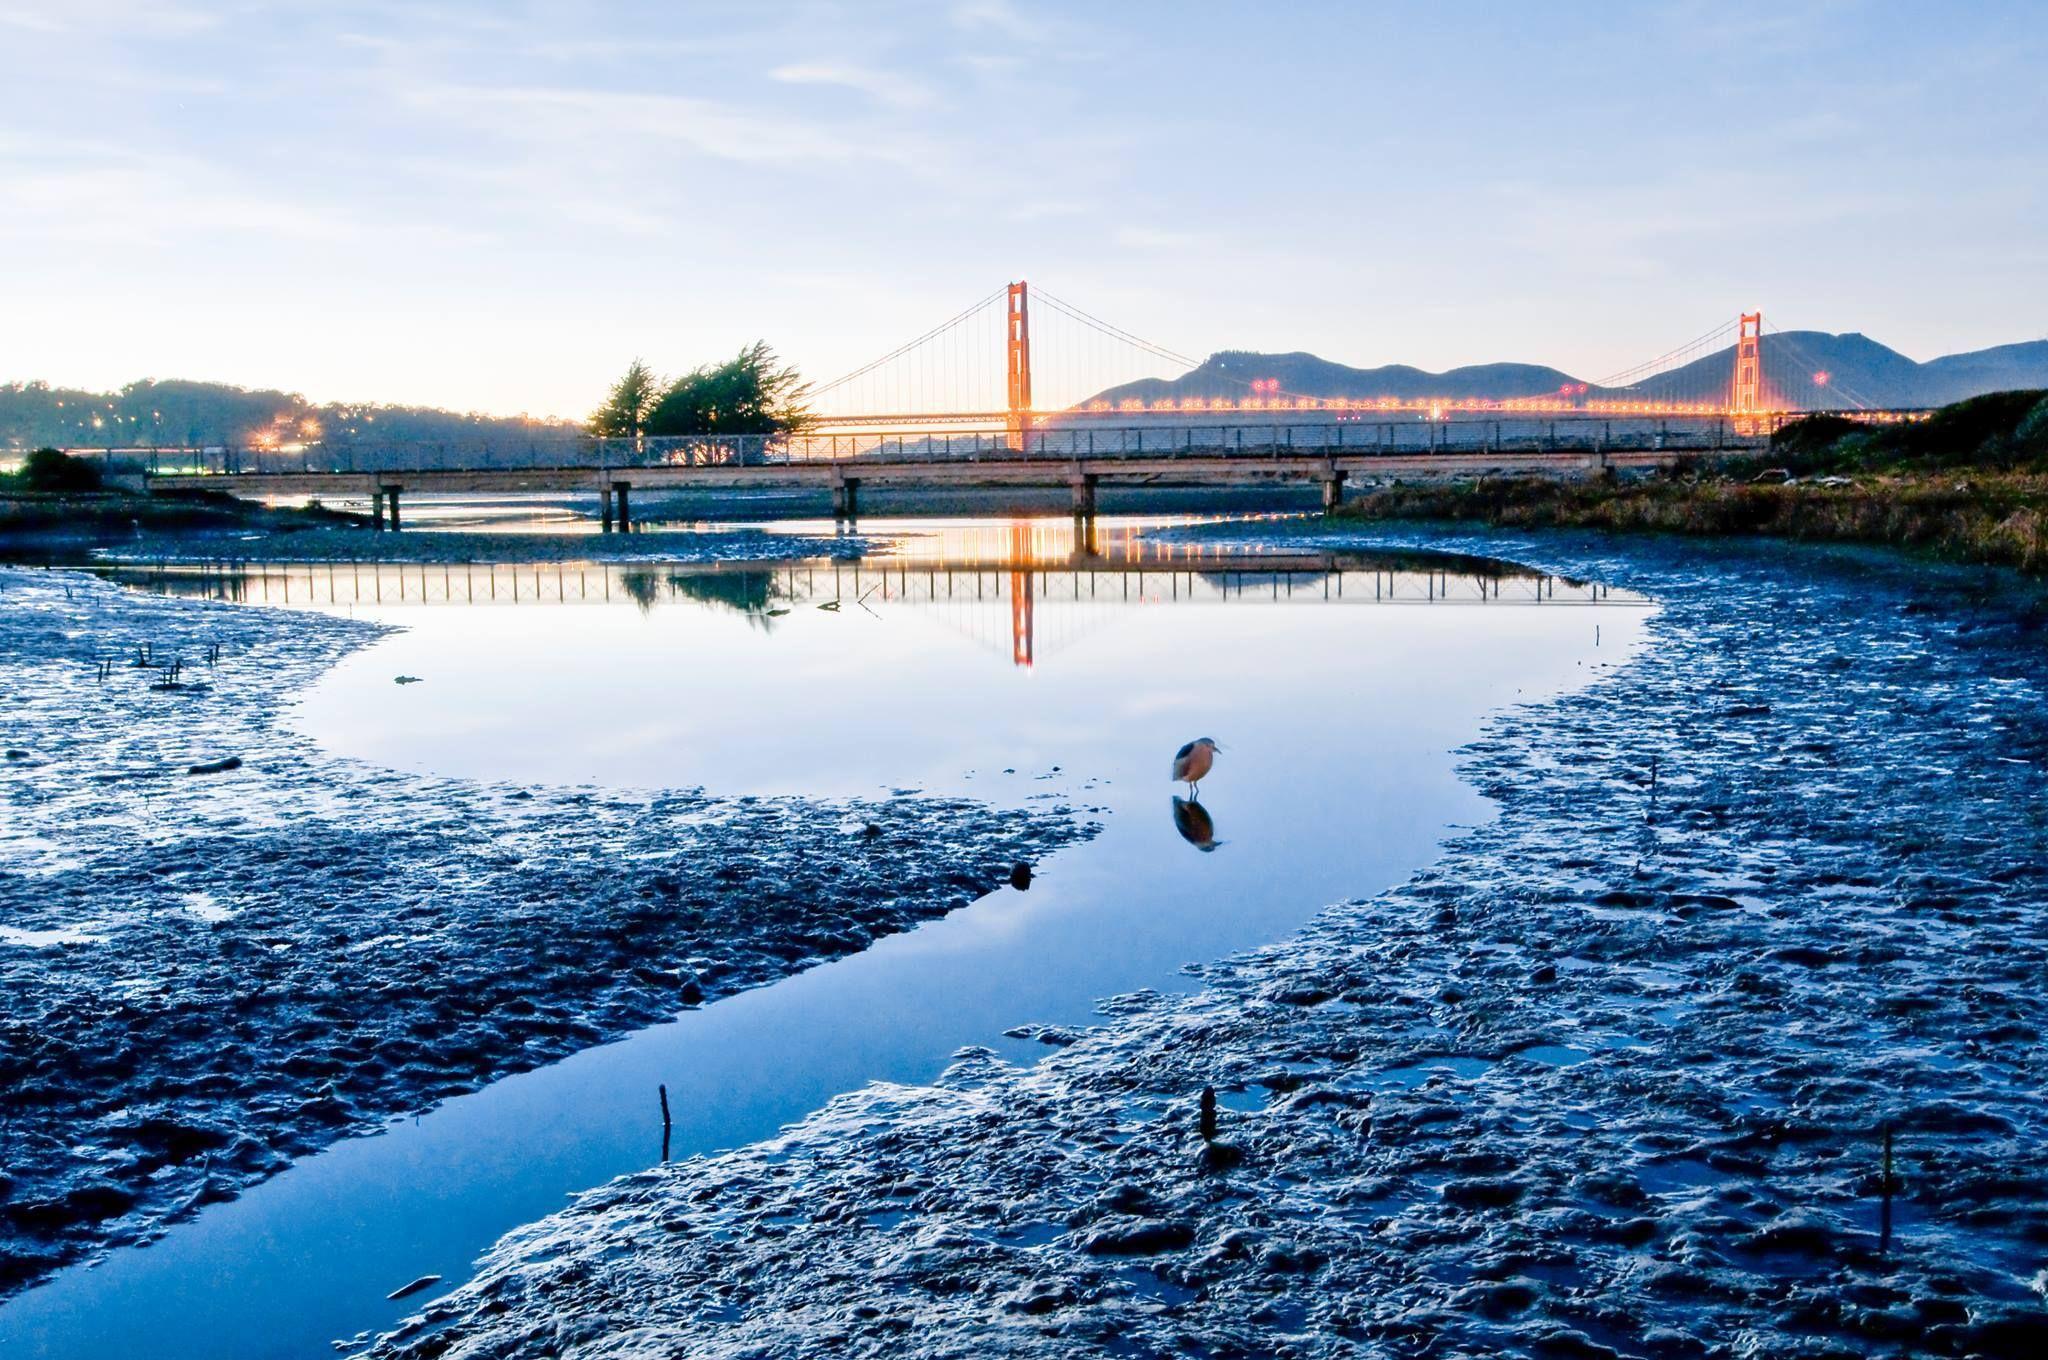 Golden Gate Bridge, Golden Gate National Recreation Area, 2014.